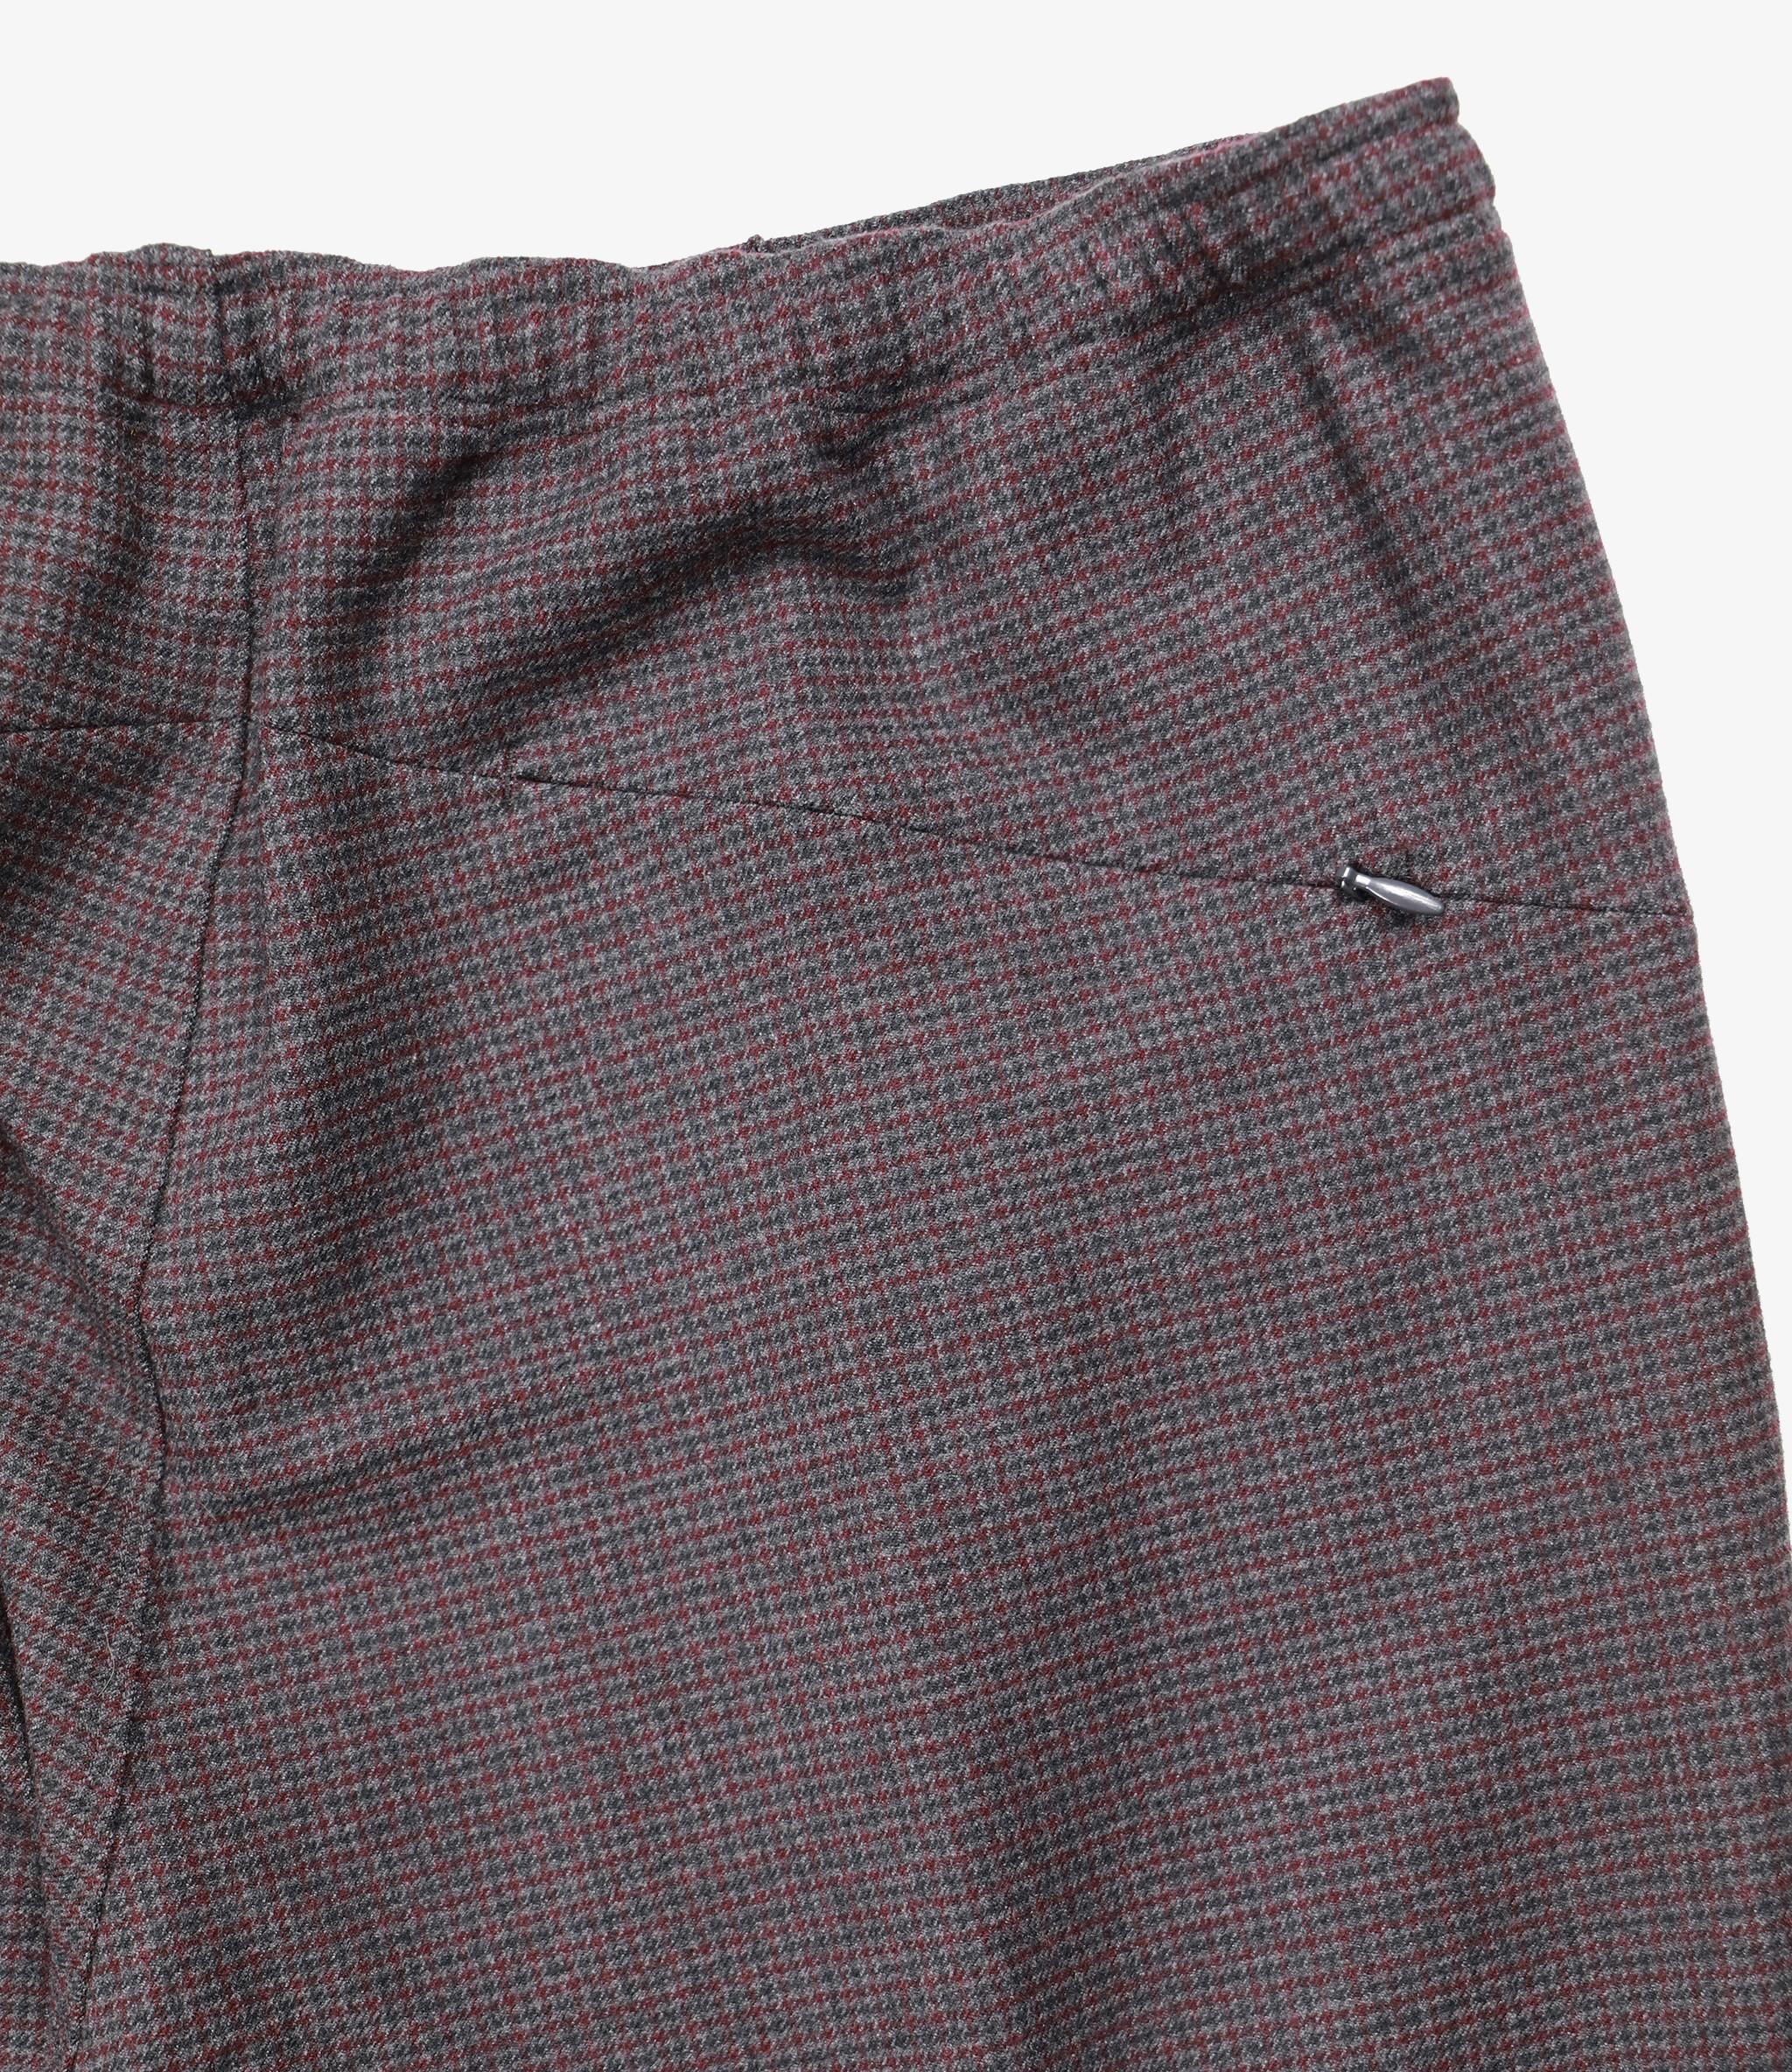 Needles W.U. Pant - Houndstooth - Charcoal